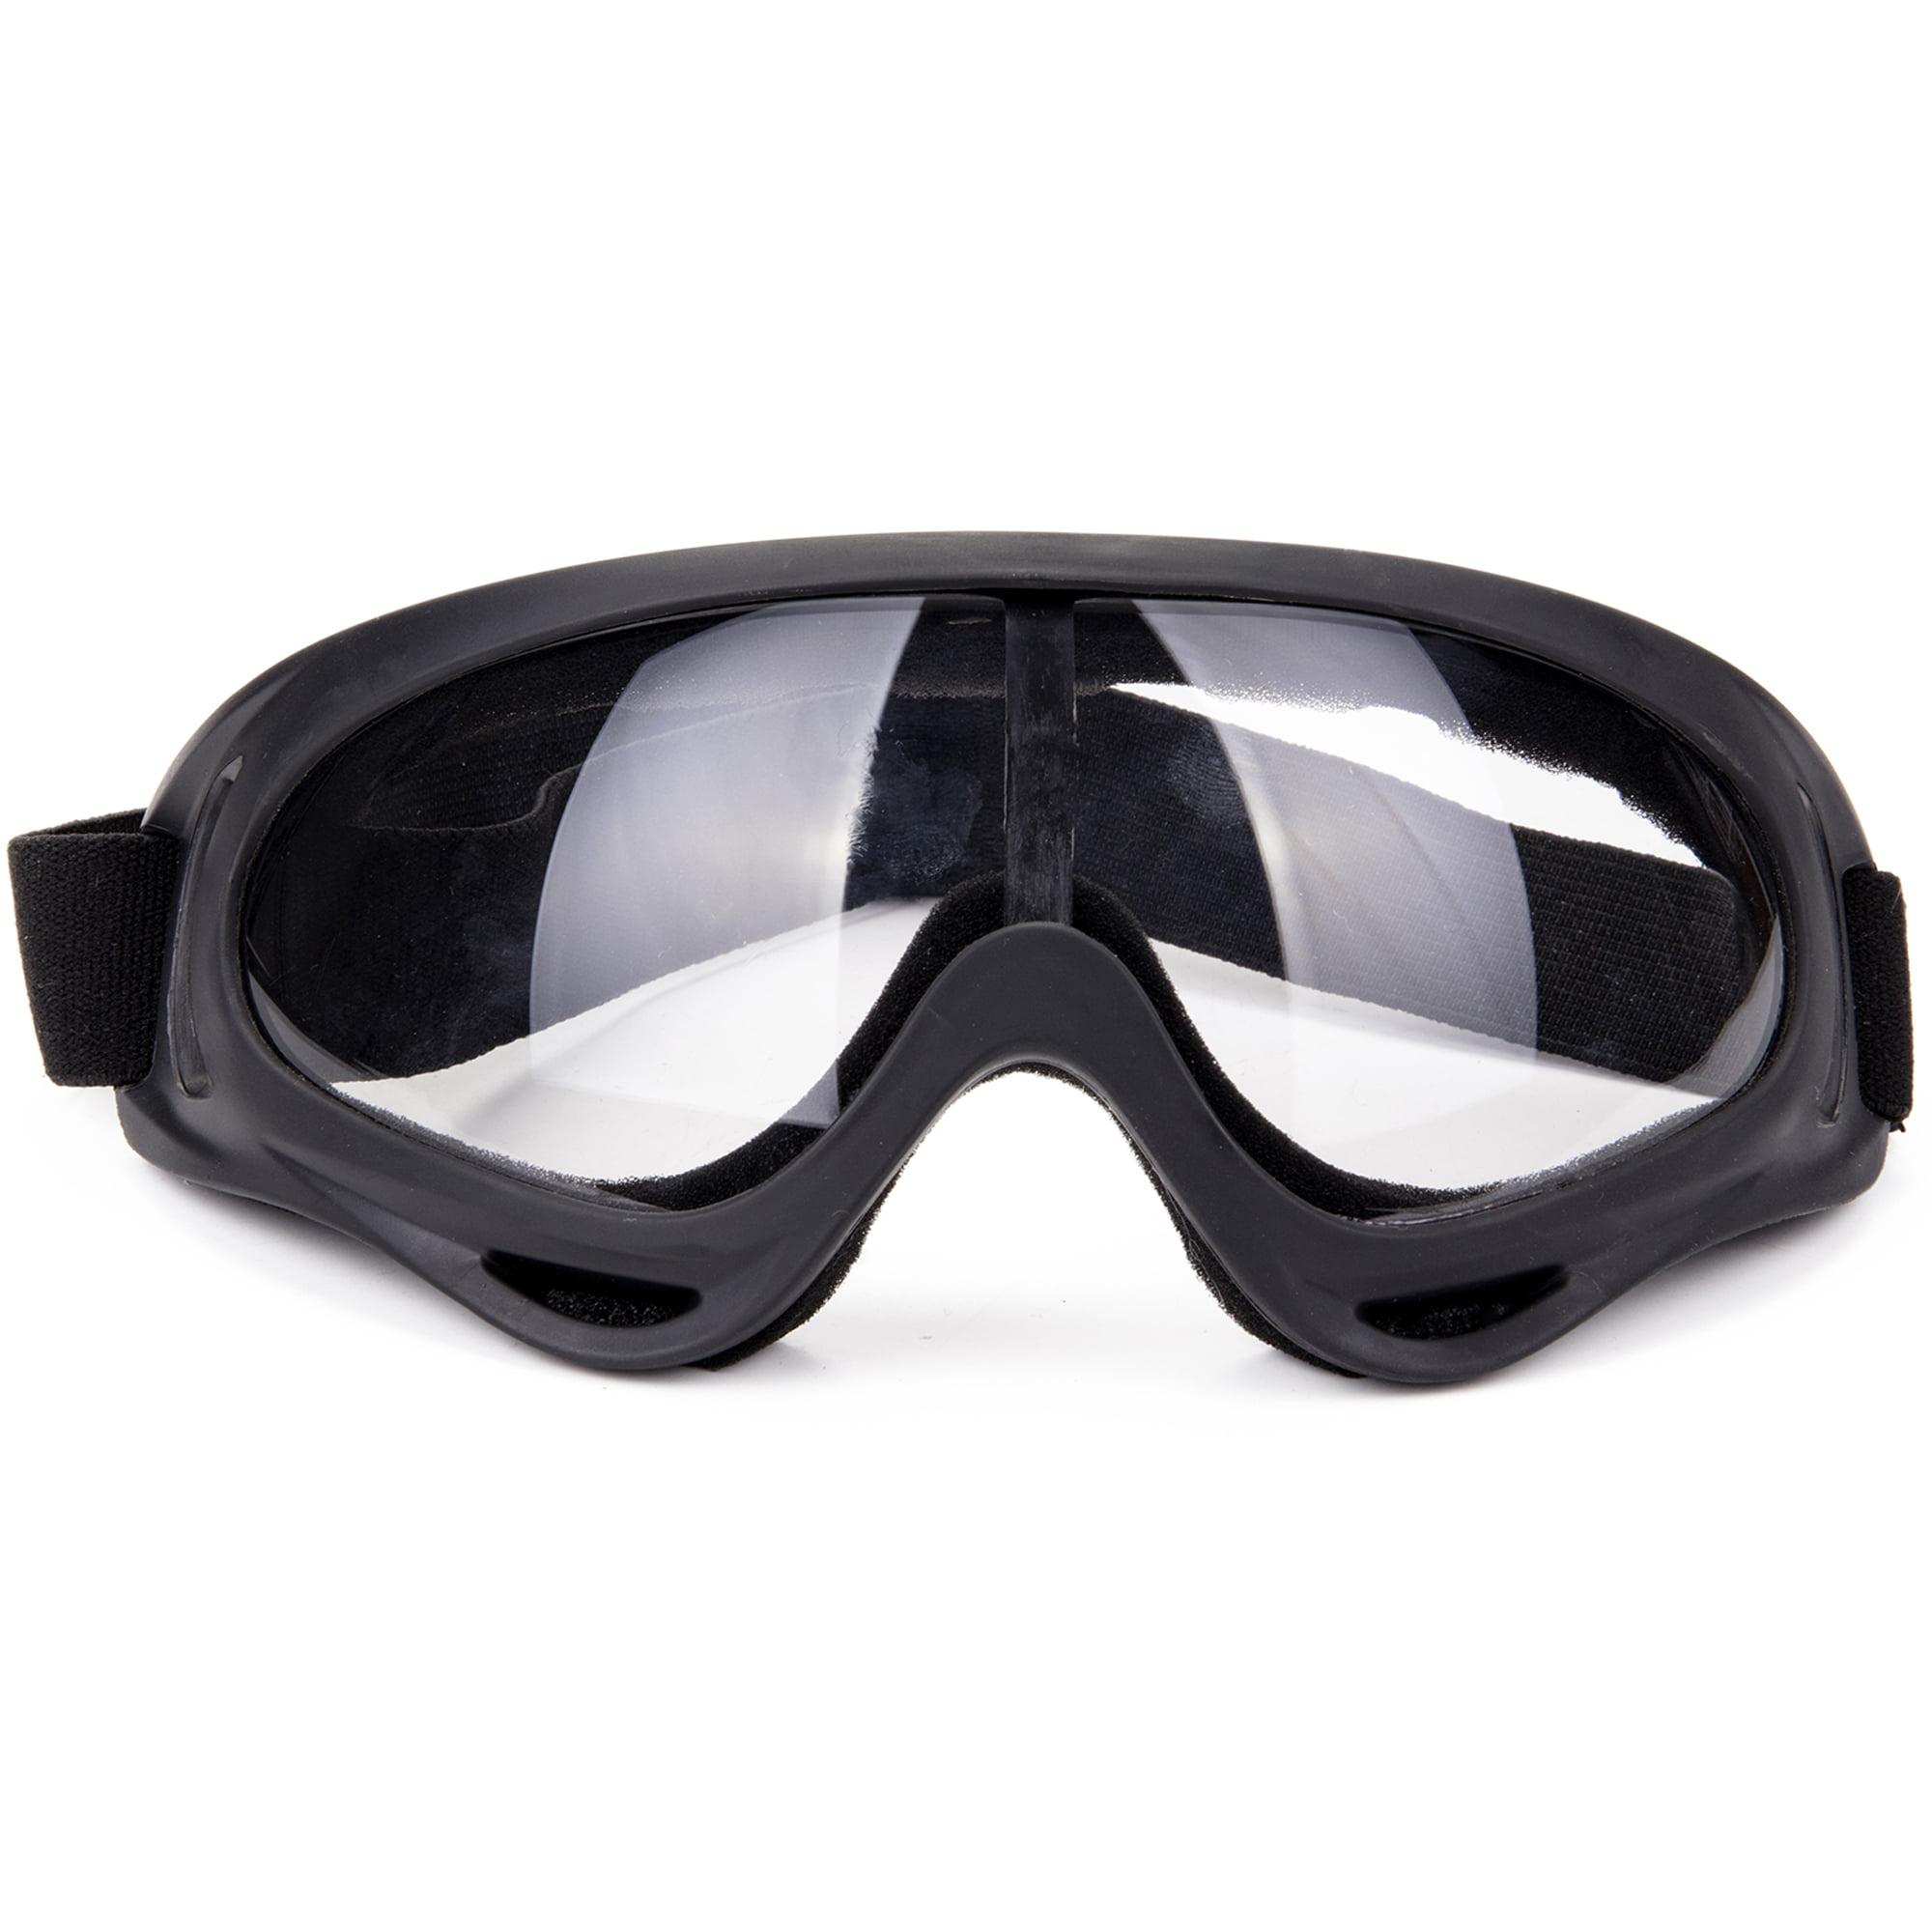 Foldable Windproof Anti-Fog Eye Glasses Snow Goggles Winter Sports Ski Cycling